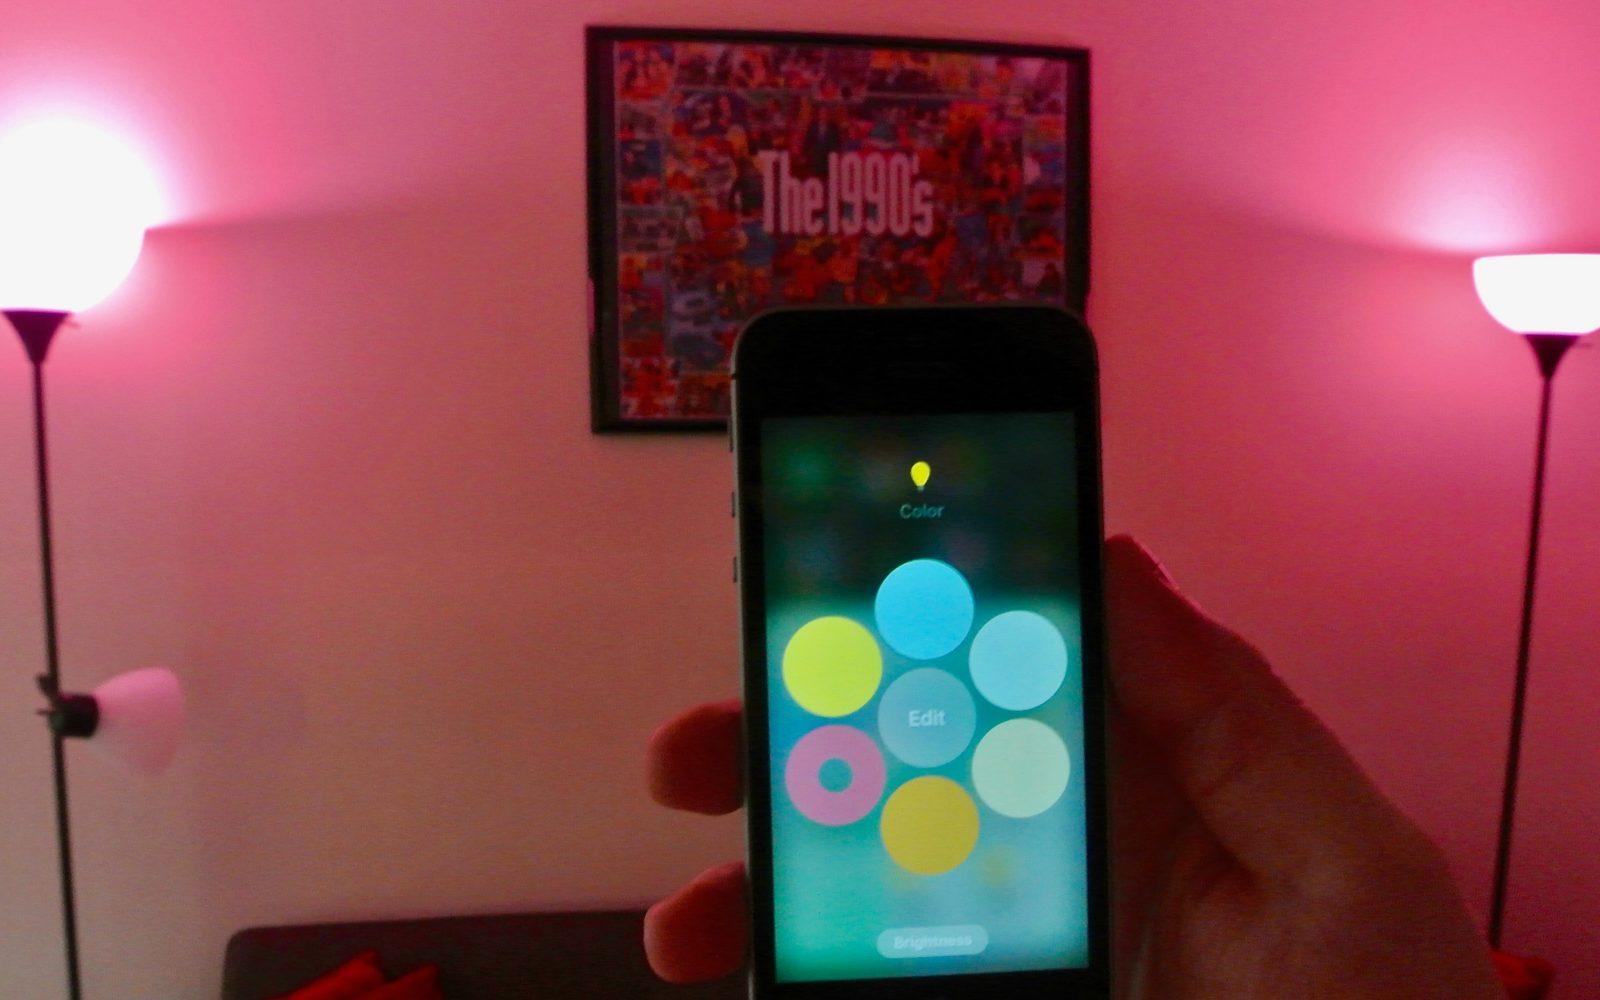 Hands-on: iOS 10 + watchOS 3 Home app for HomeKit on iPhone